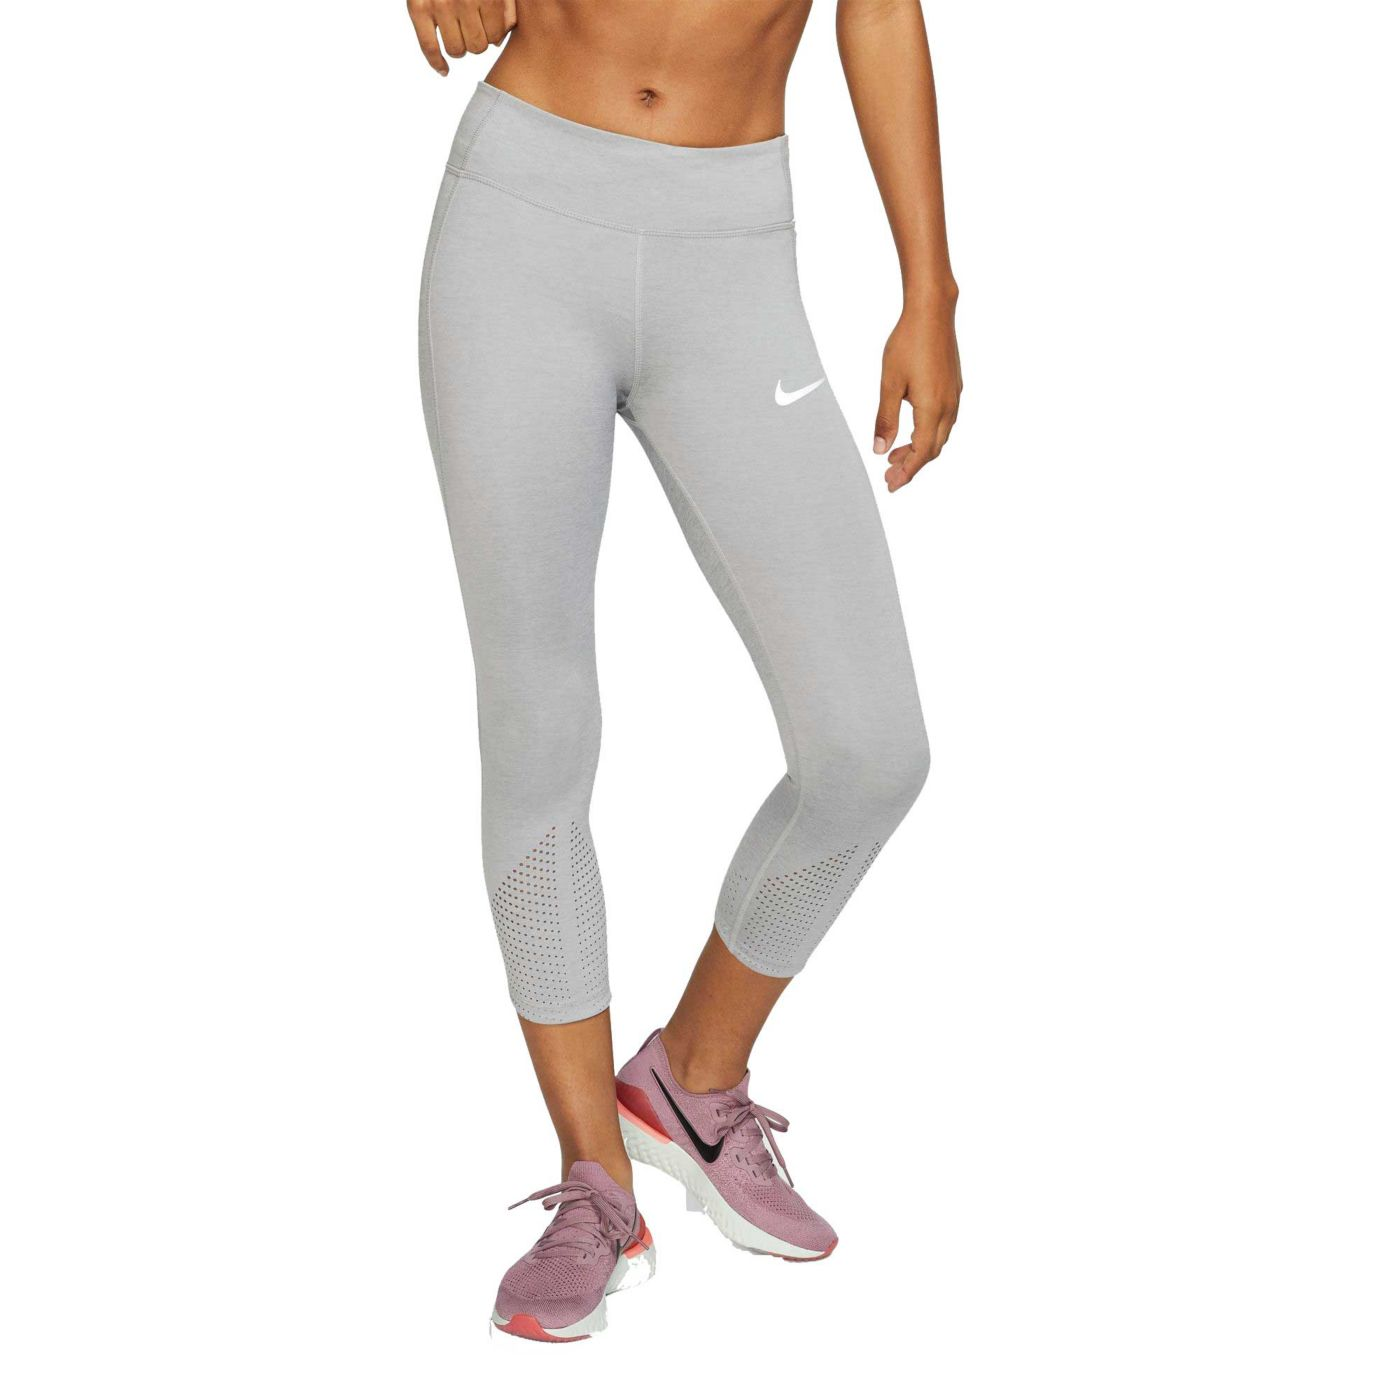 Nike Women's Epic Lux Running Cropped Leggings